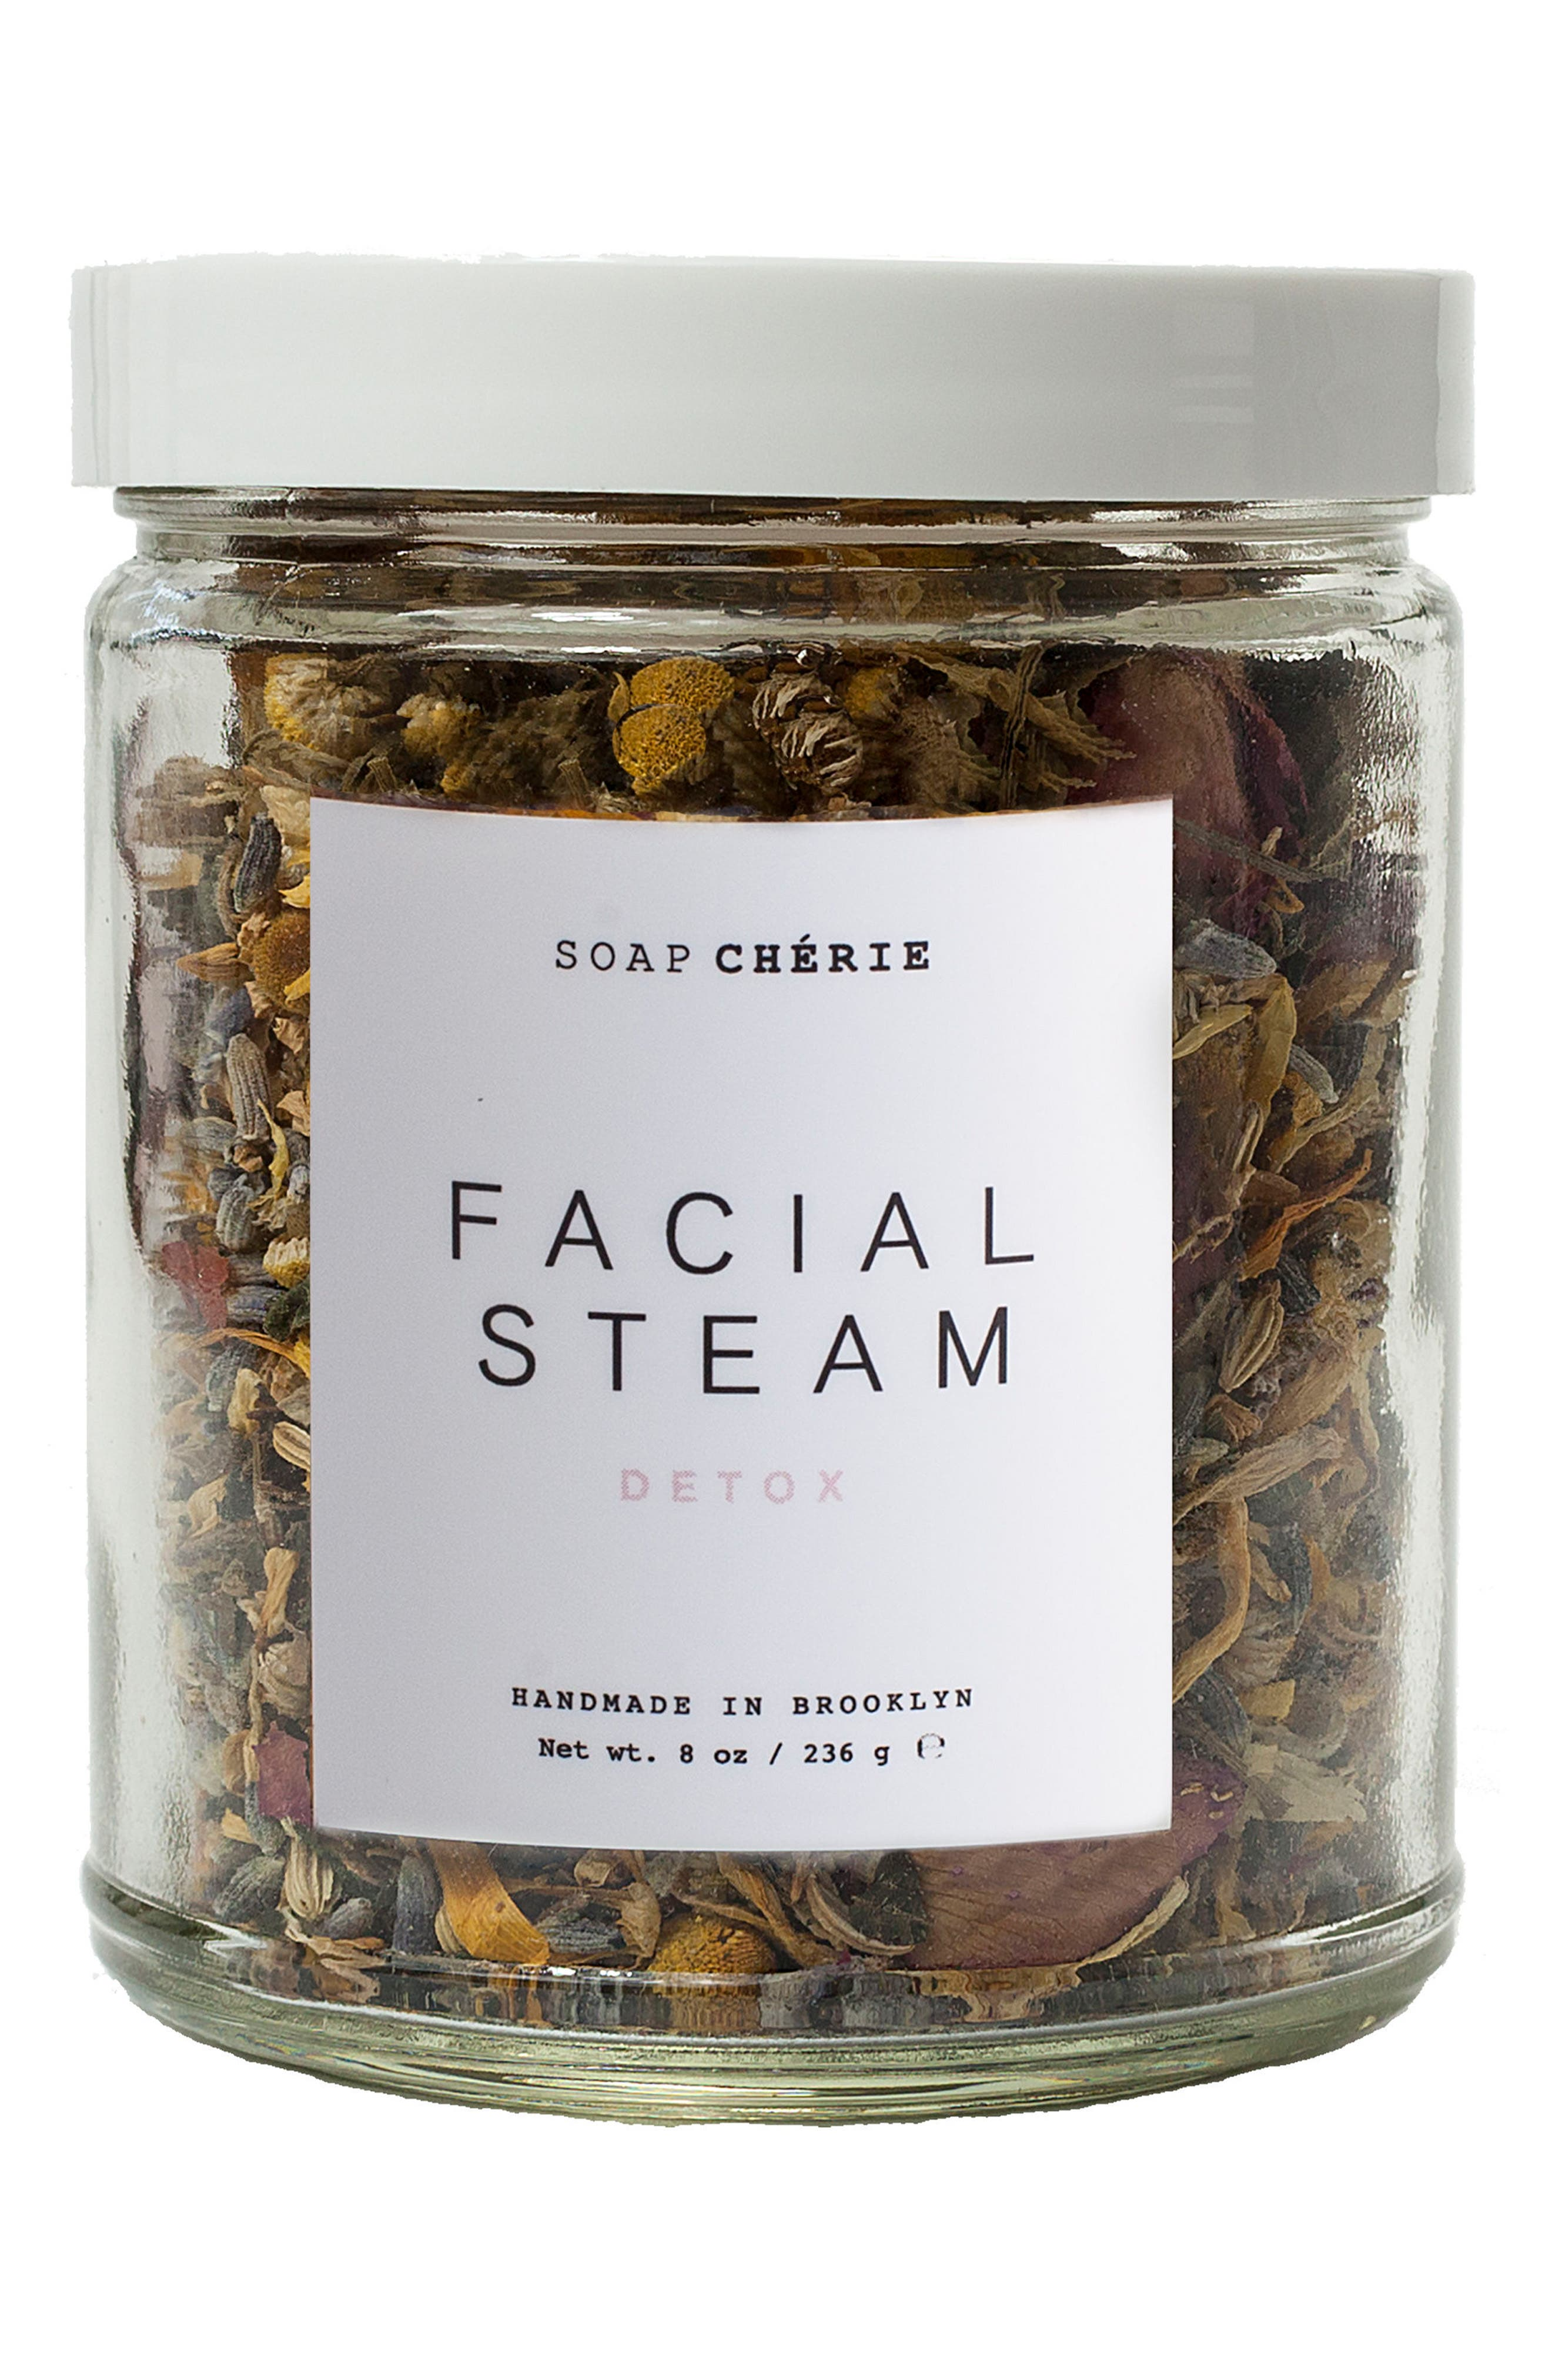 Soap Chérie Detox Facial Steam